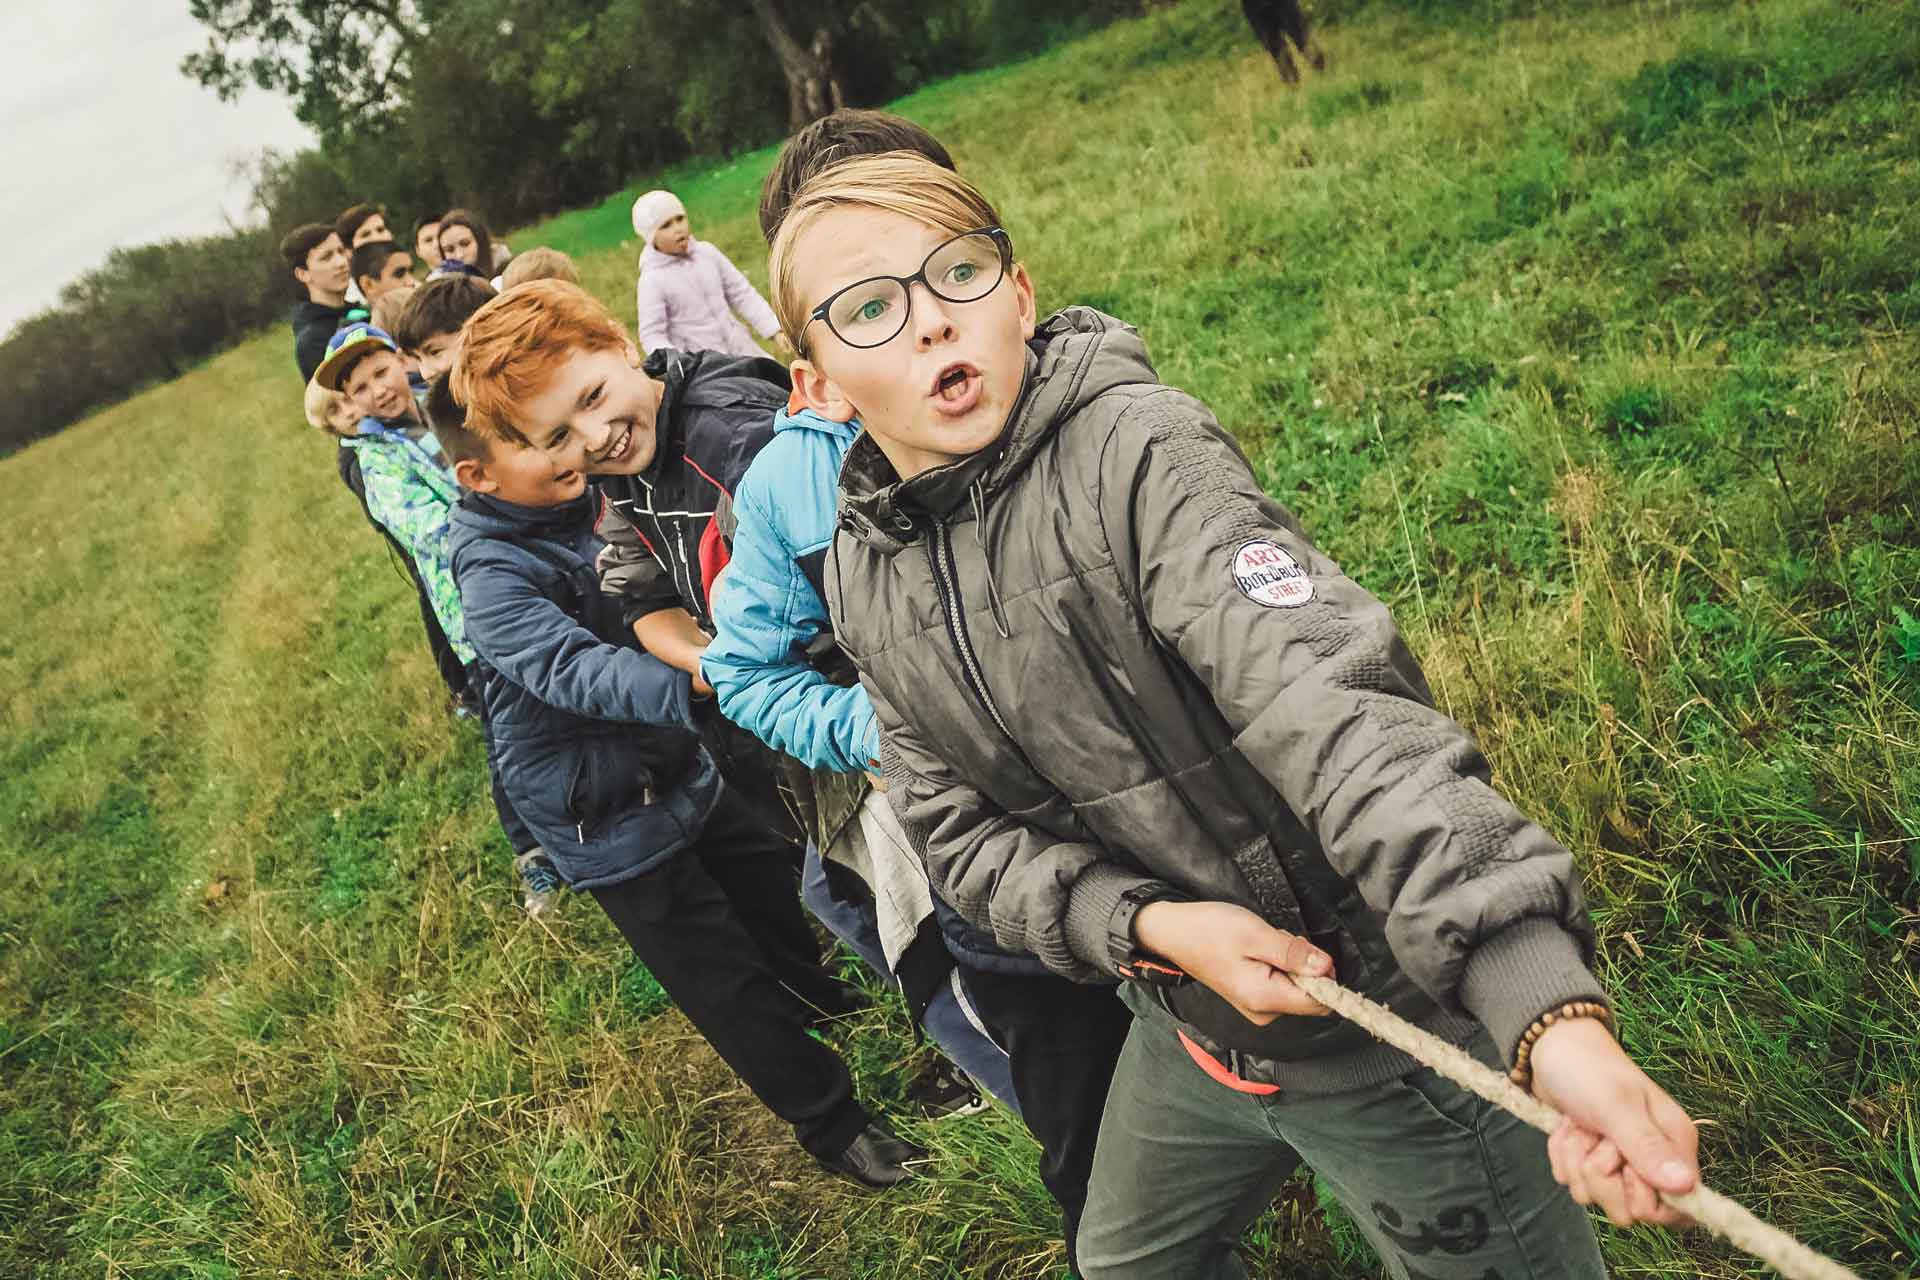 Children having fun in a tug-of-war